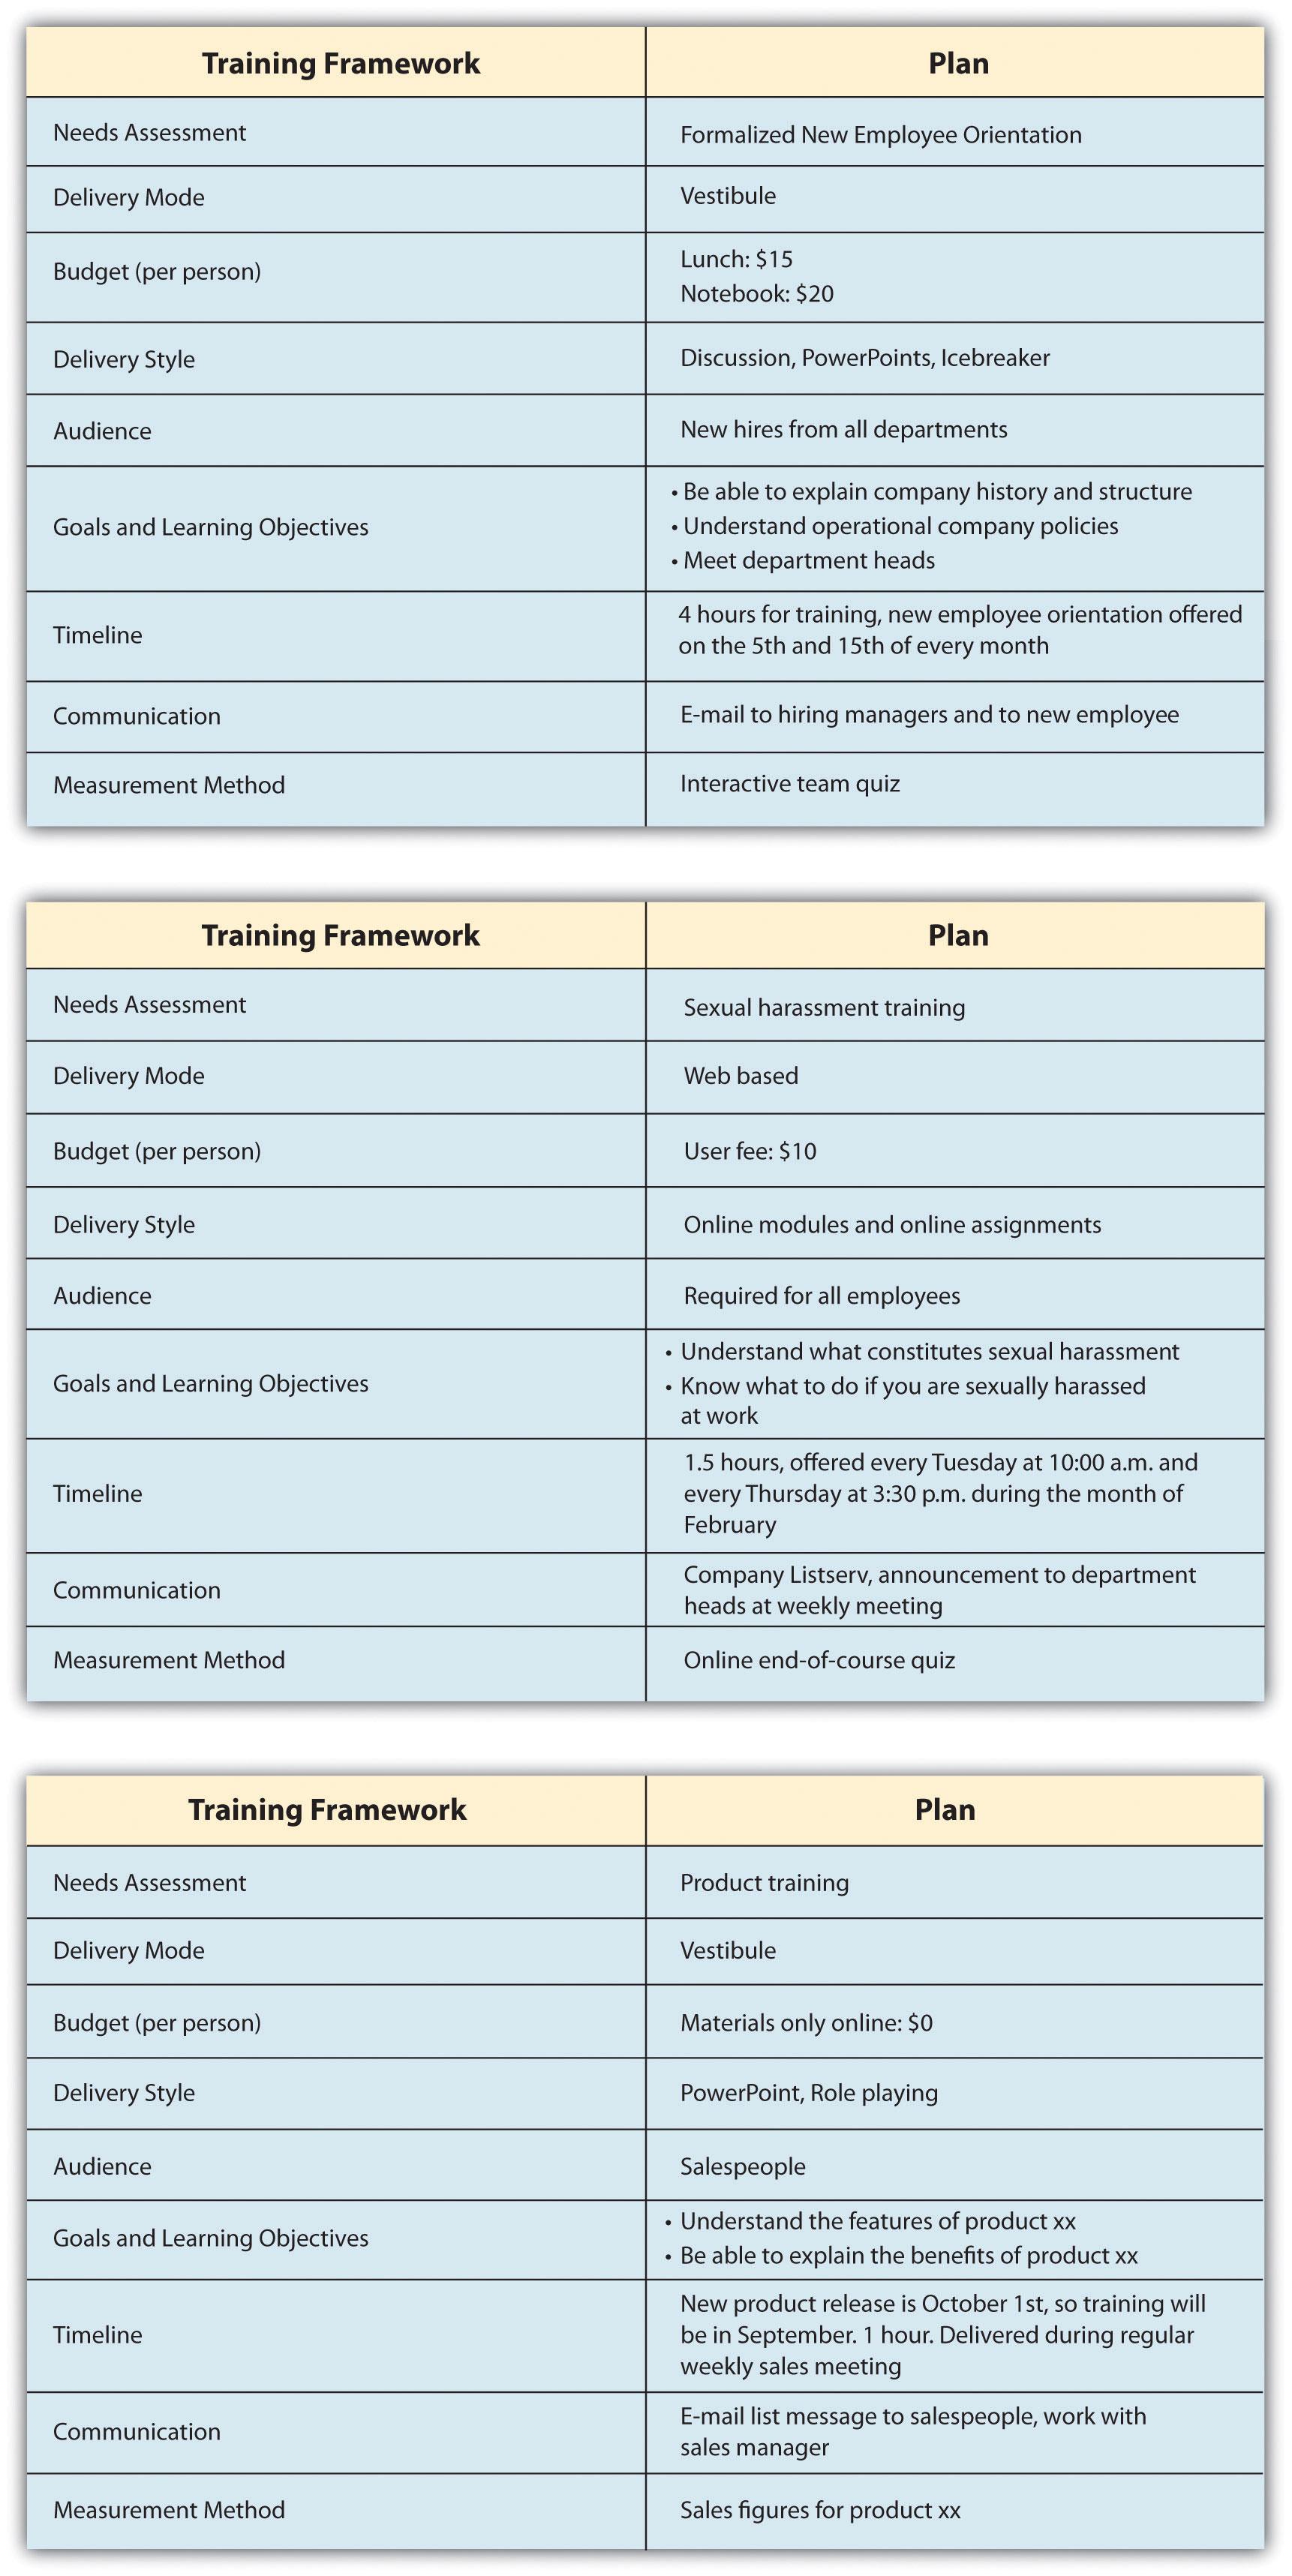 8.4 Designing a Training Program | Human Resource Management